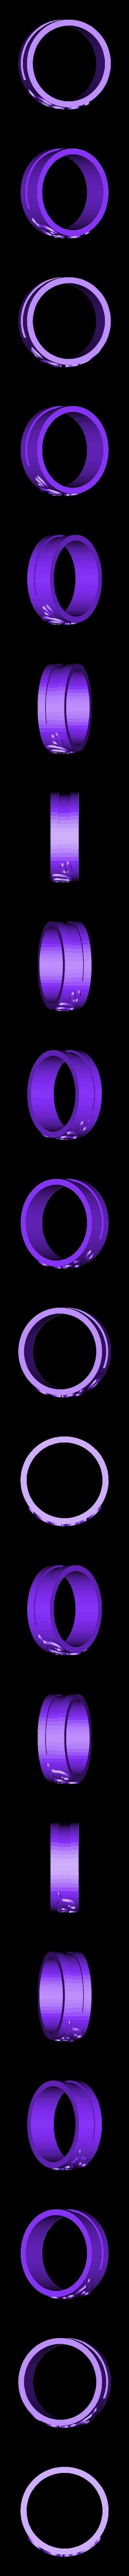 anillo love 19 cerrado hendidura.stl Télécharger fichier STL gratuit Anillo / Ring Love • Design pour impression 3D, amg3D